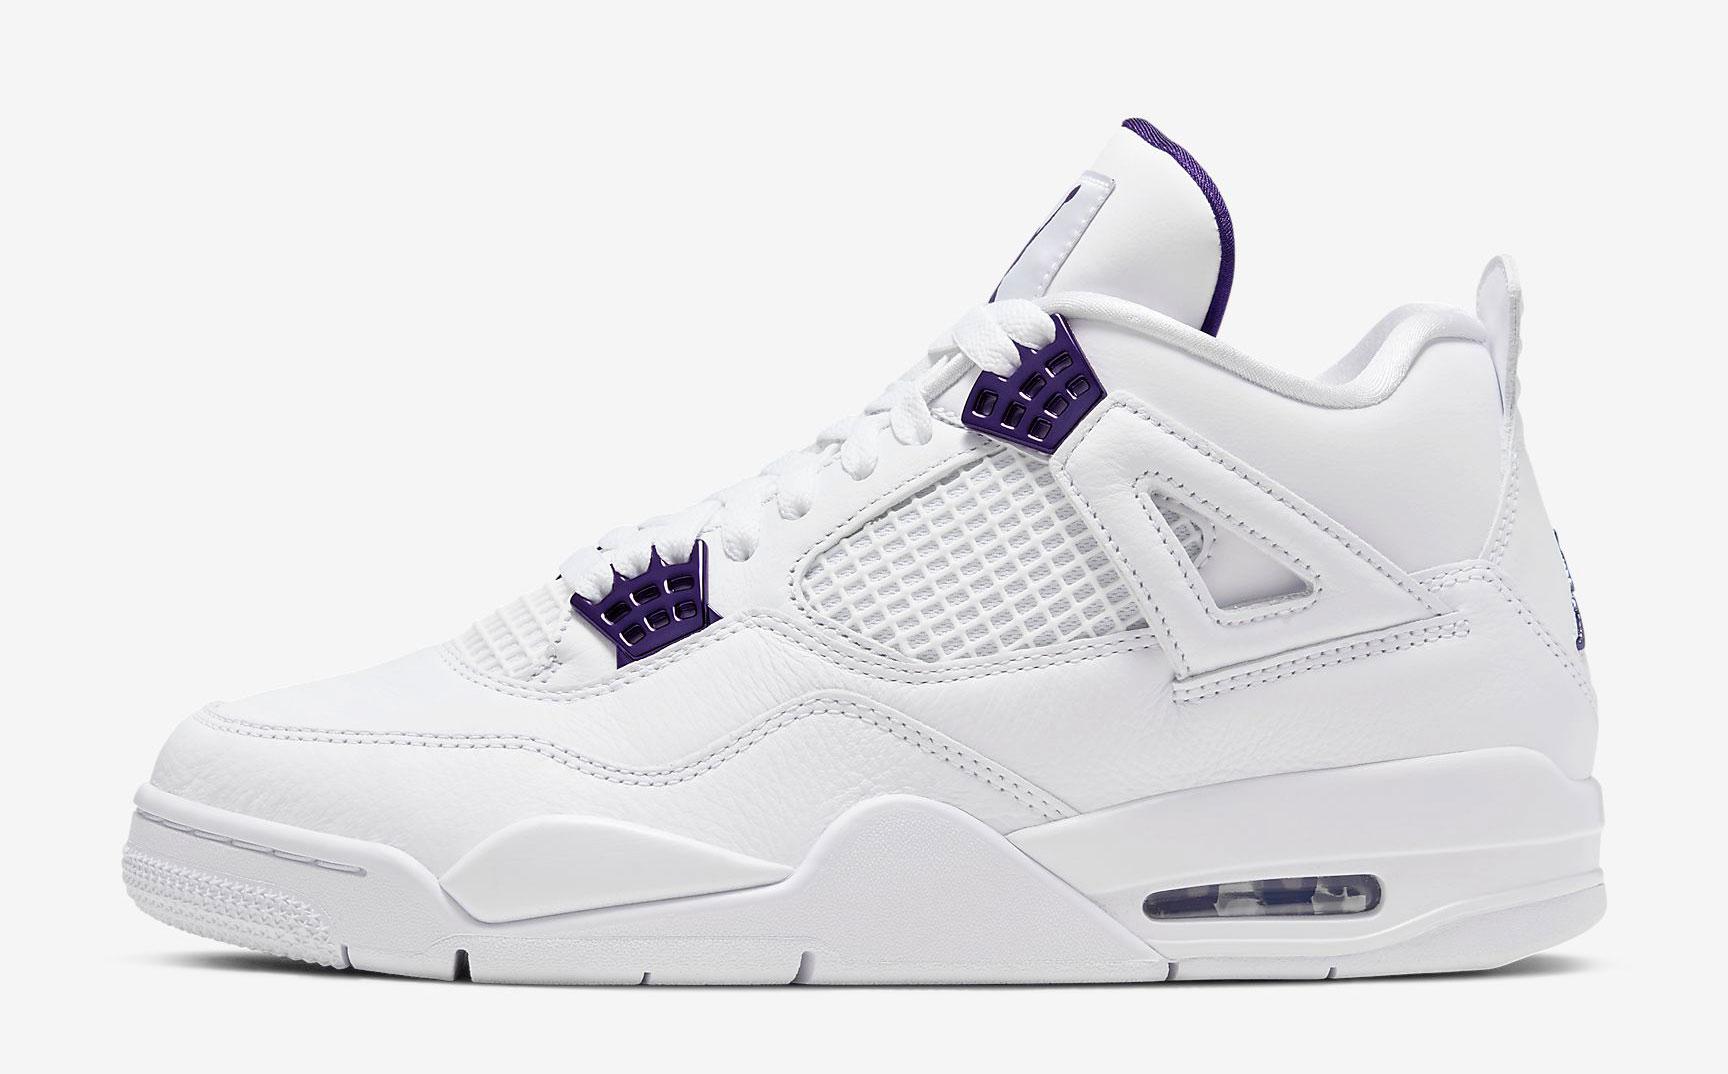 air-jordan-4-purple-metallic-release-date-price-2